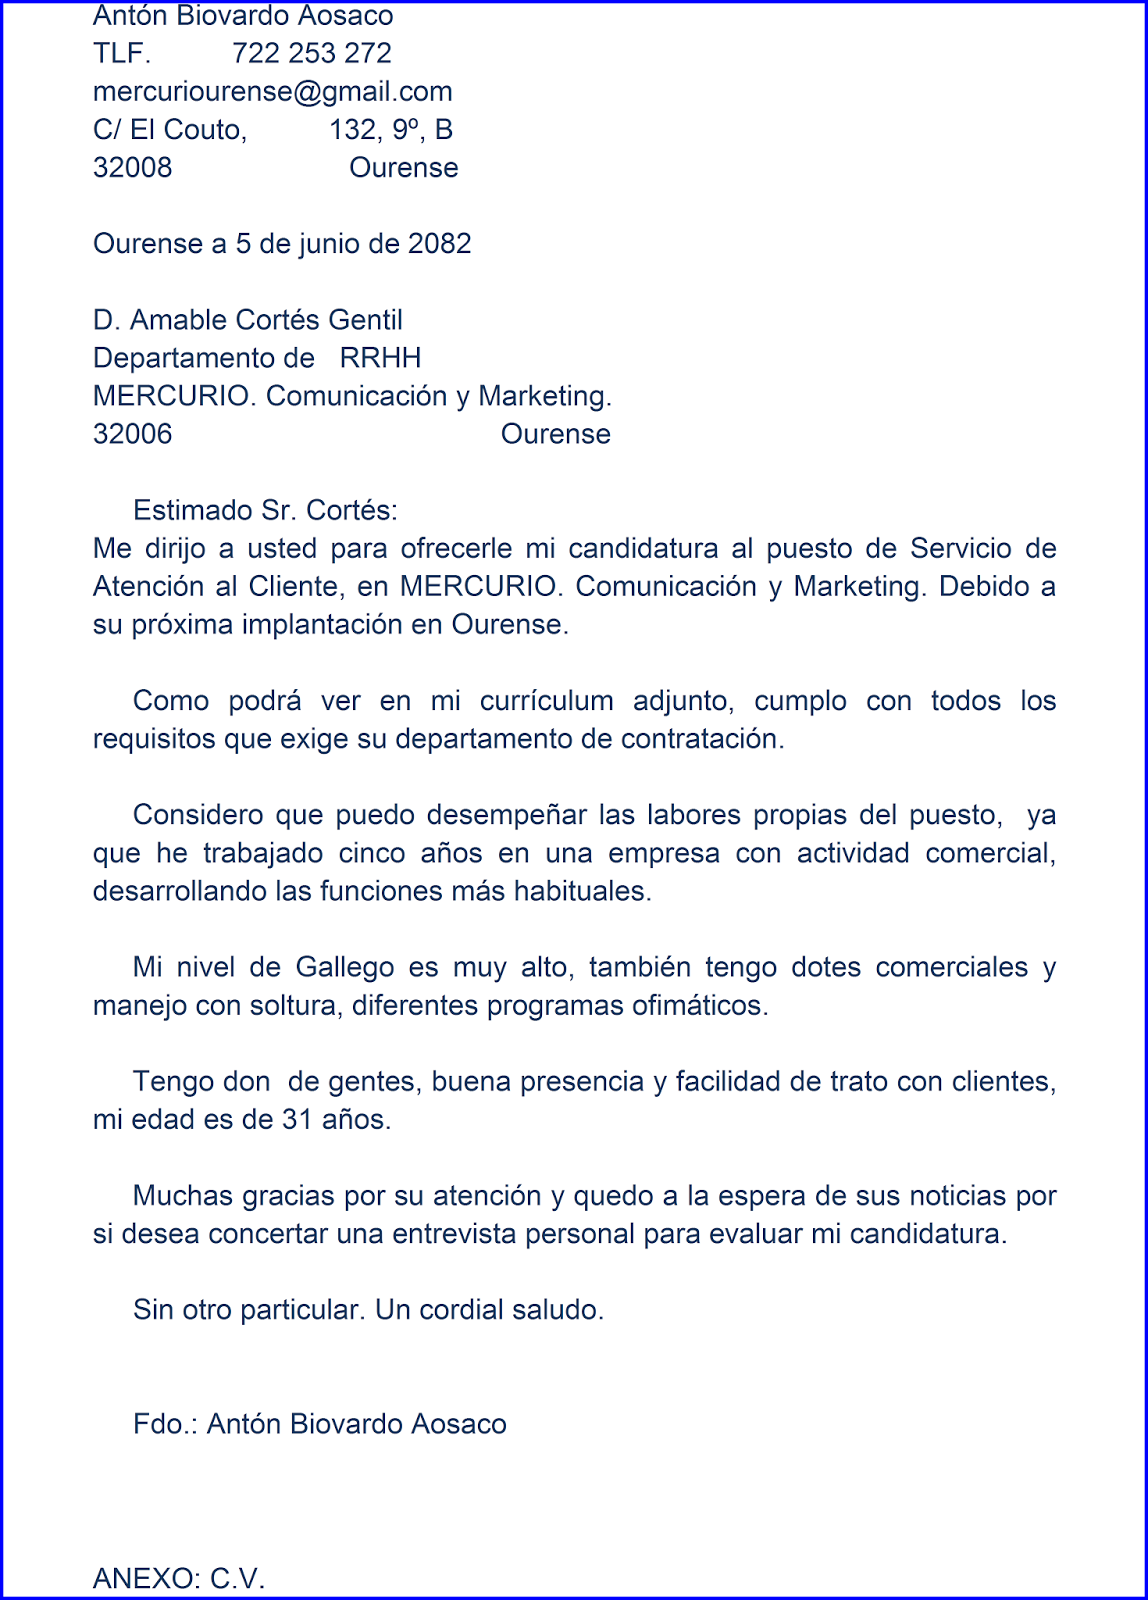 Carta De Demanda De Trabajo Carta De Demanda De Trabajo Carta De ...